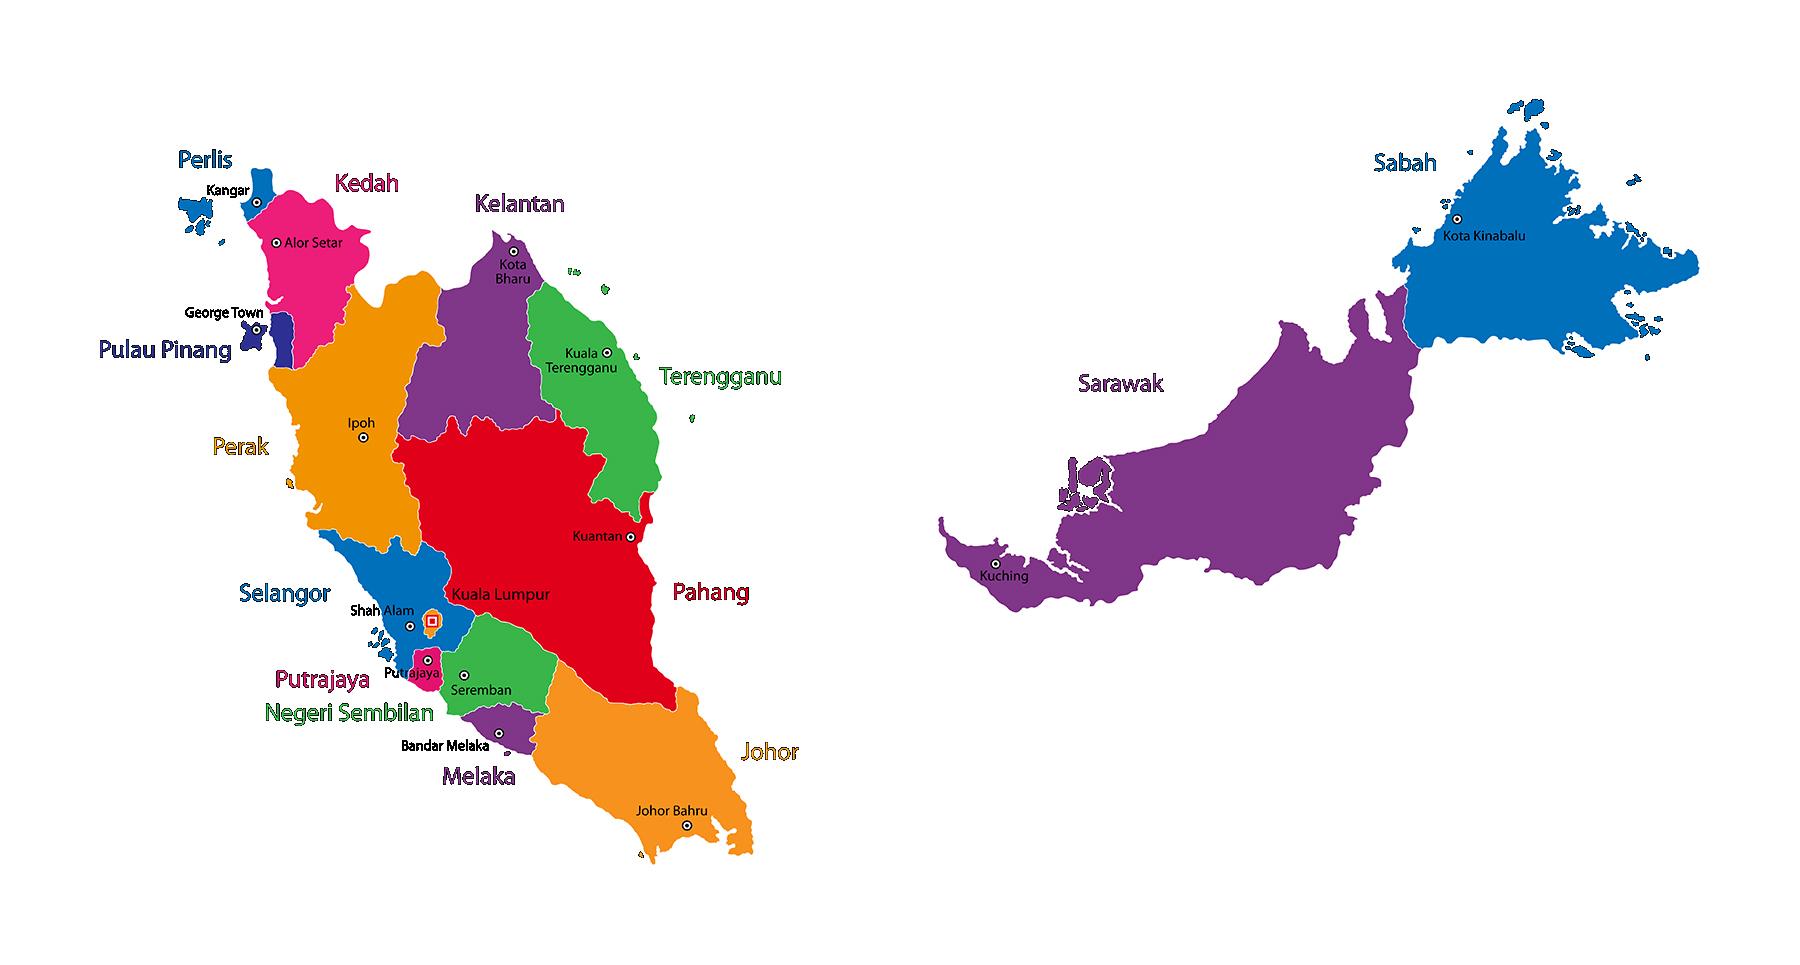 large-states-map-of-malaysia